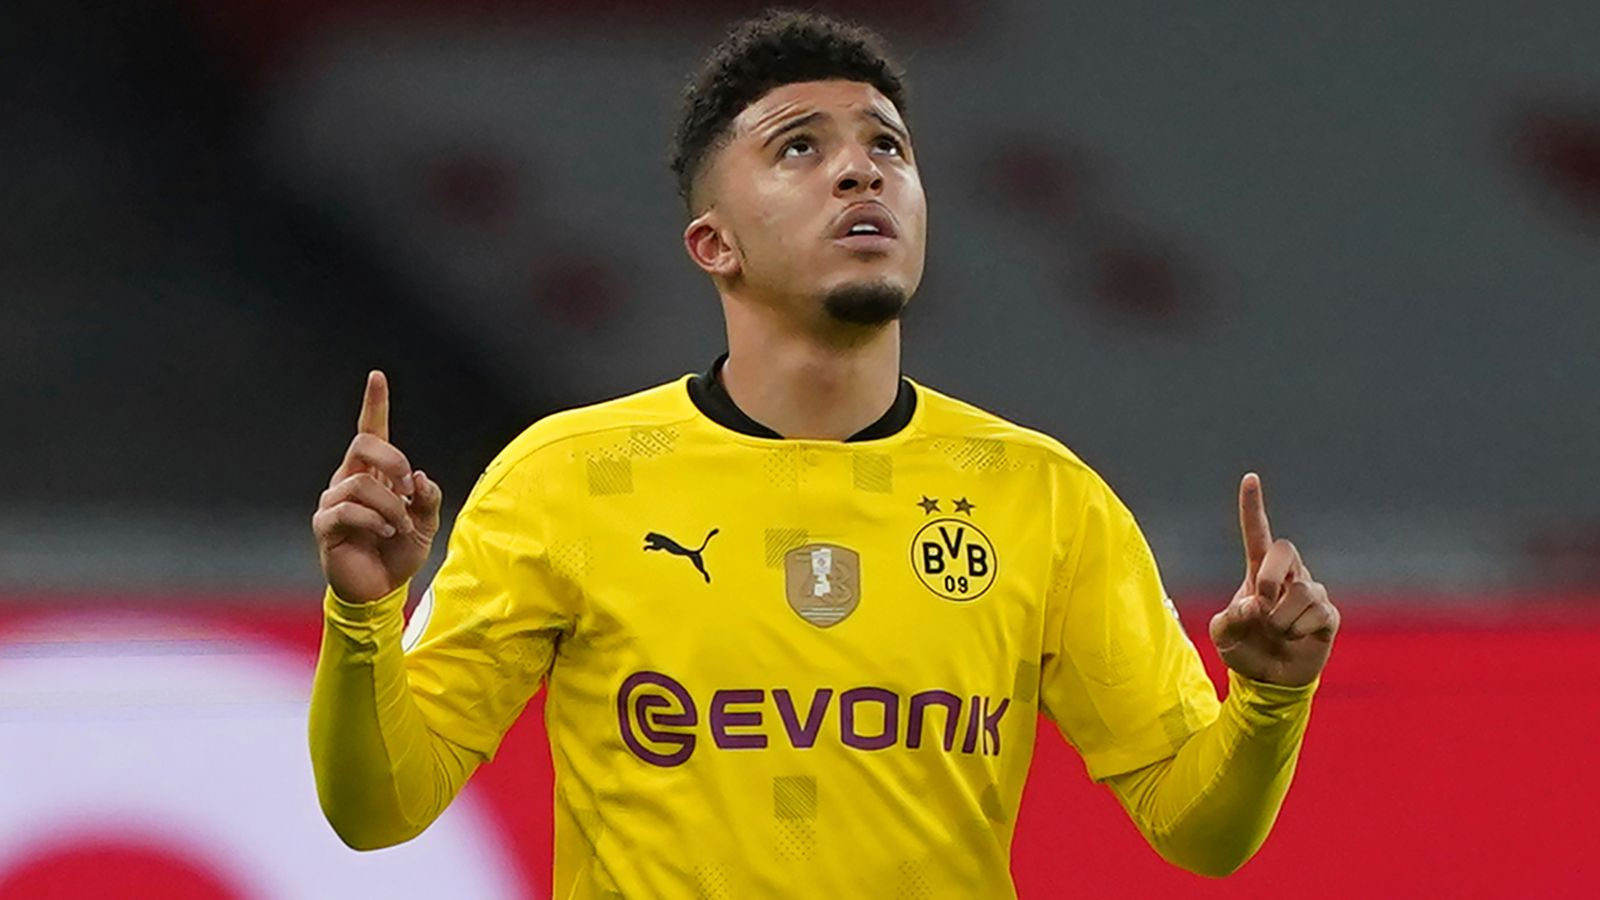 Jadon Sancho: Man Utd and Borussia Dortmund £11m apart in valuation for England forward